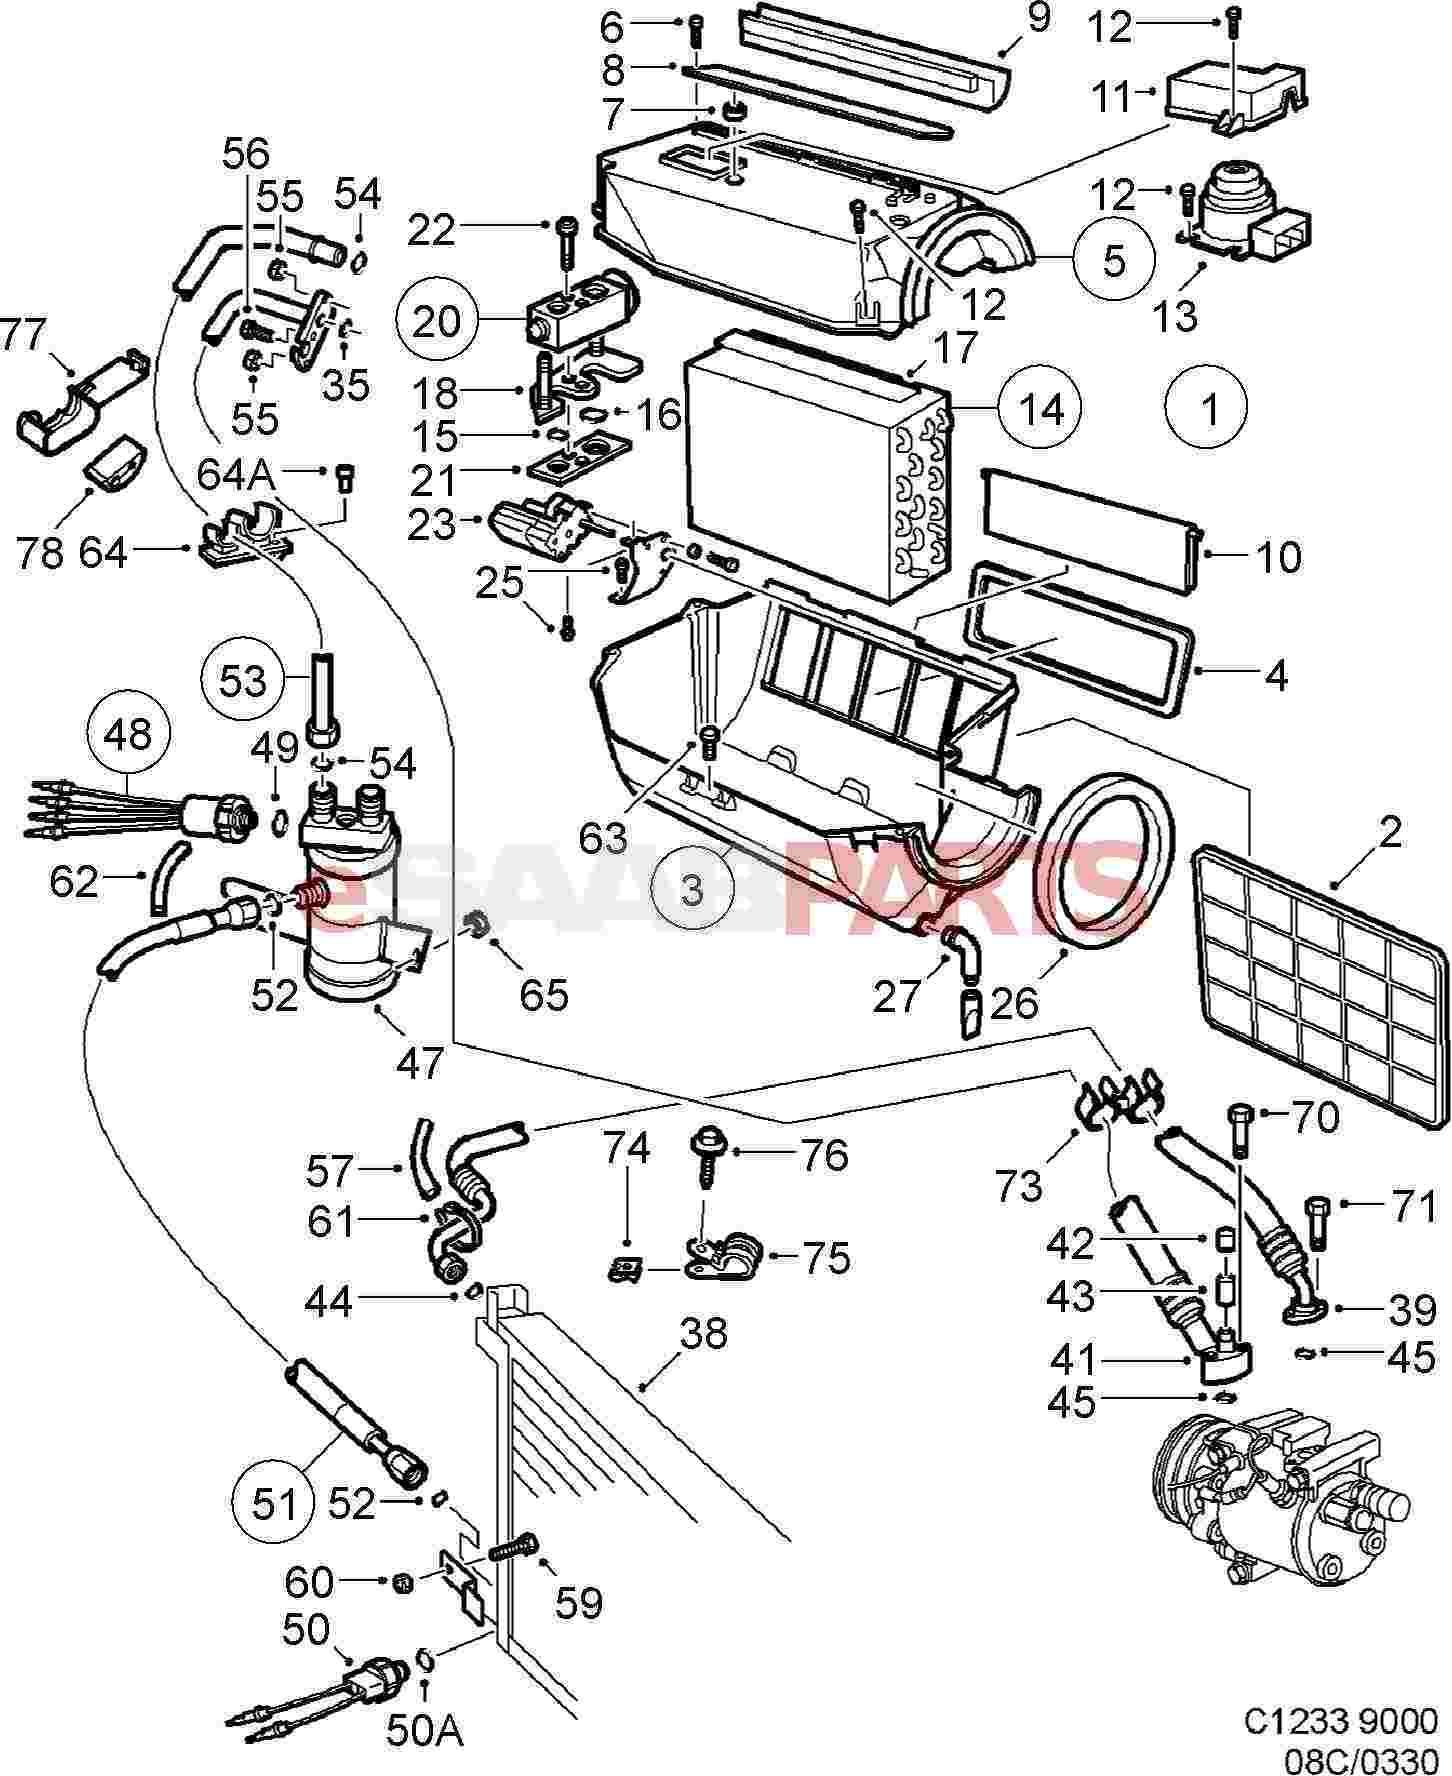 Wrg Saab Air Conditioning Wiring Diagram